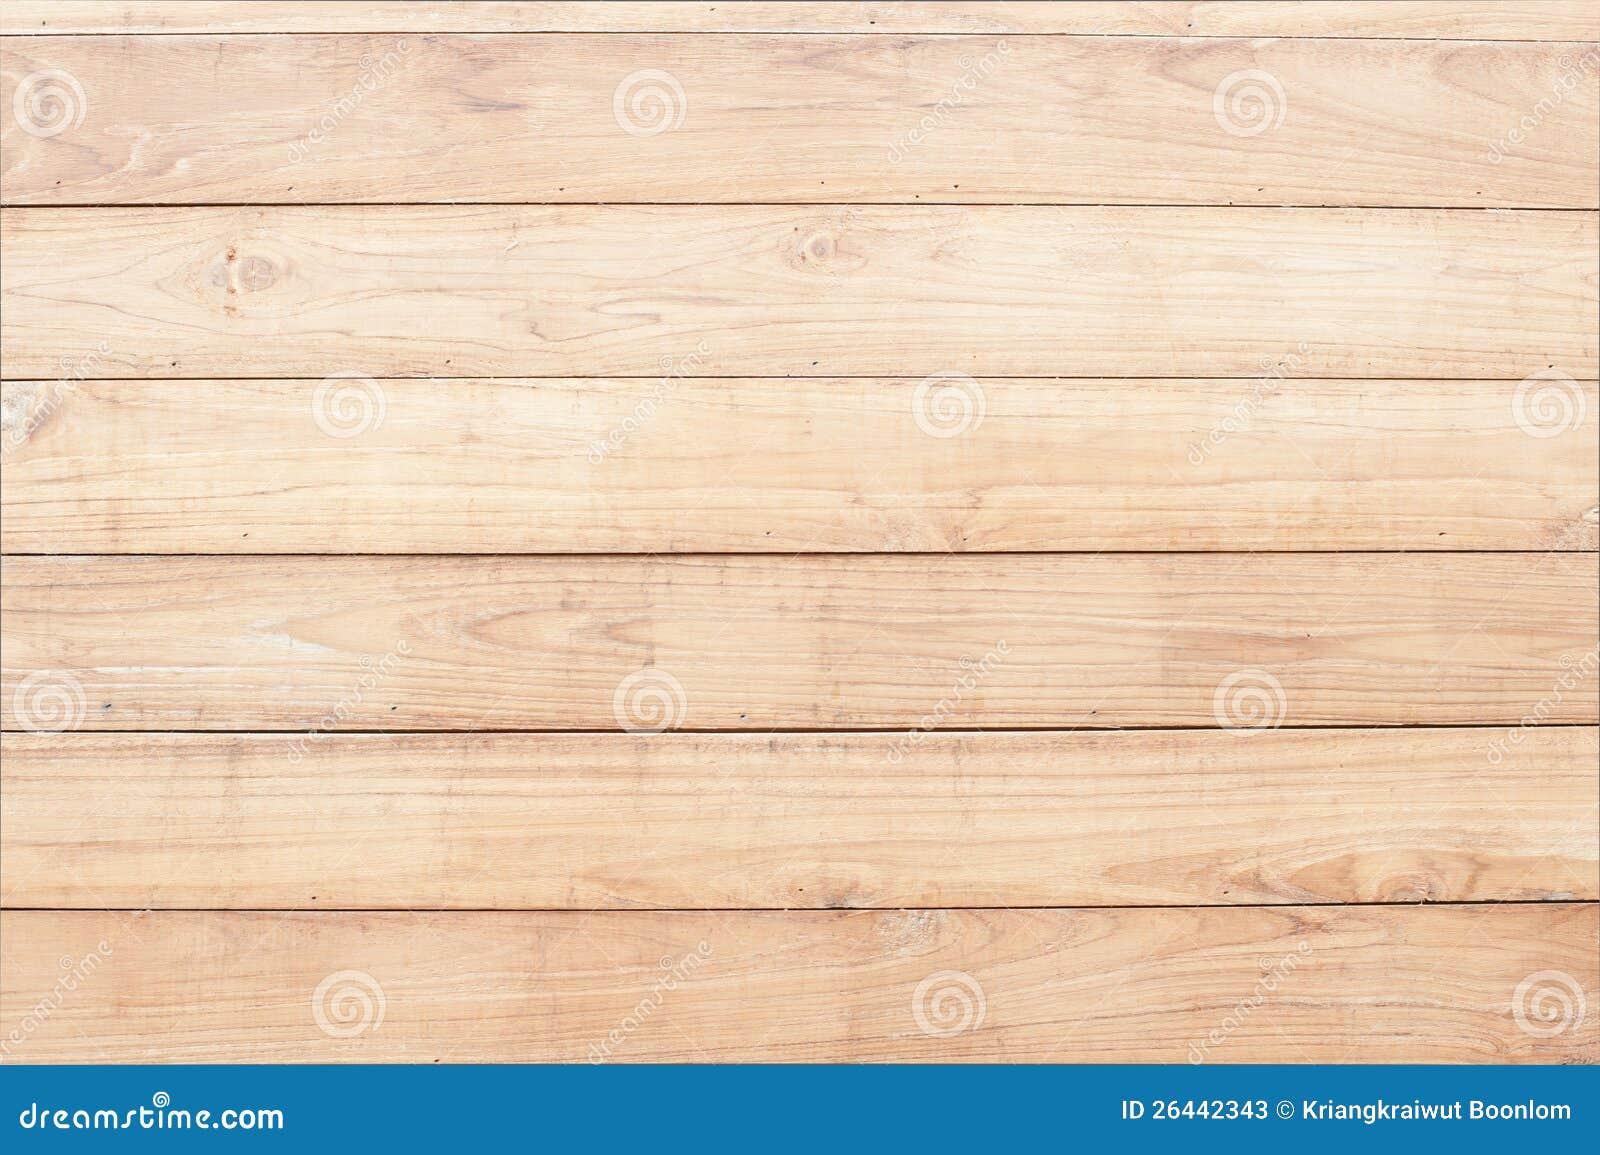 Fondo de madera marrón claro